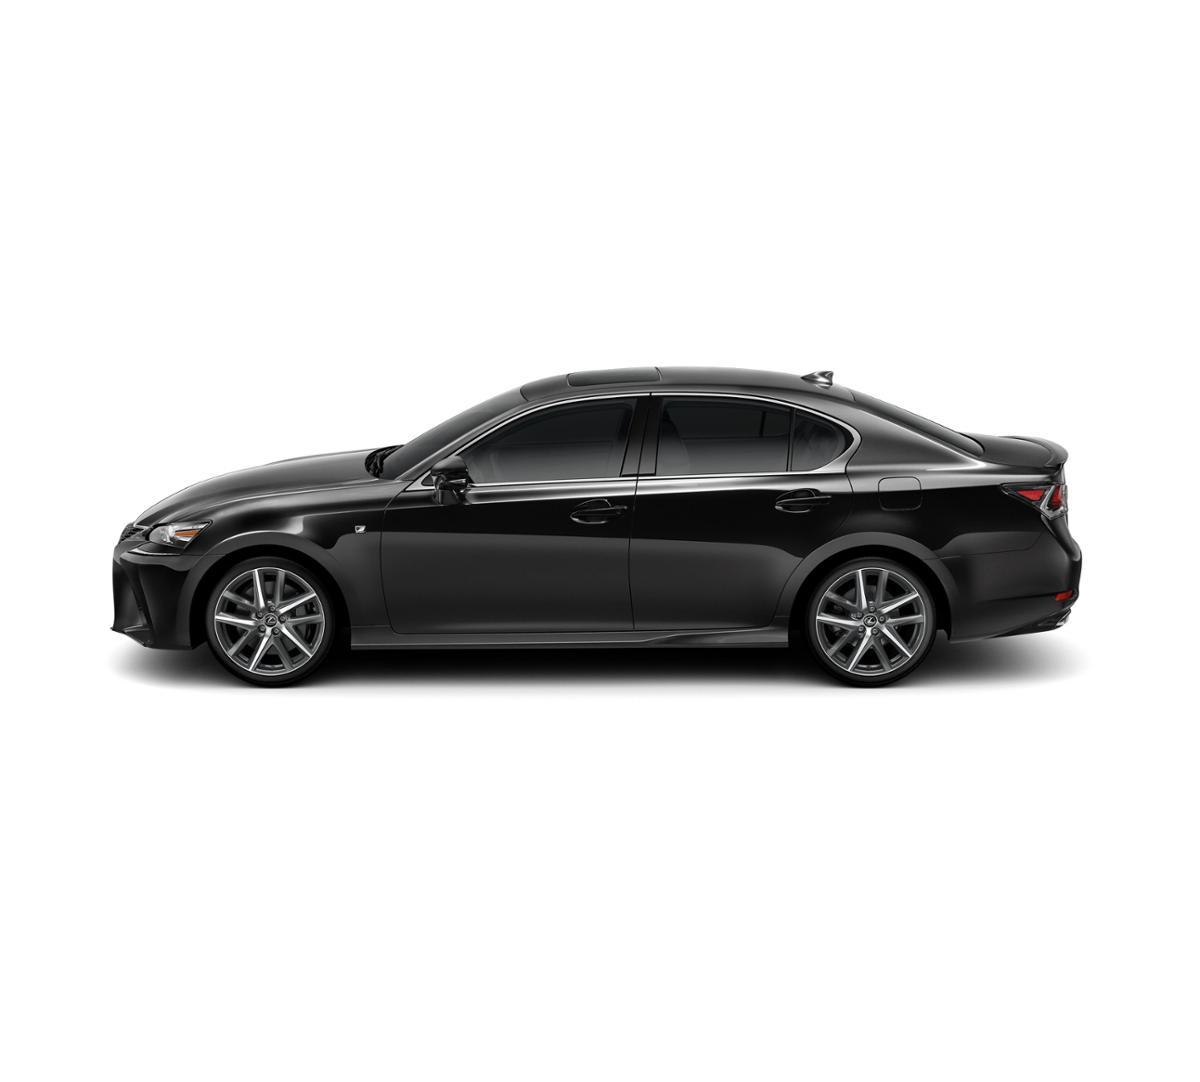 2014 Lexus Is F Sport For Sale: New Caviar 2019 Lexus GS 350 F SPORT For Sale Fremont, CA